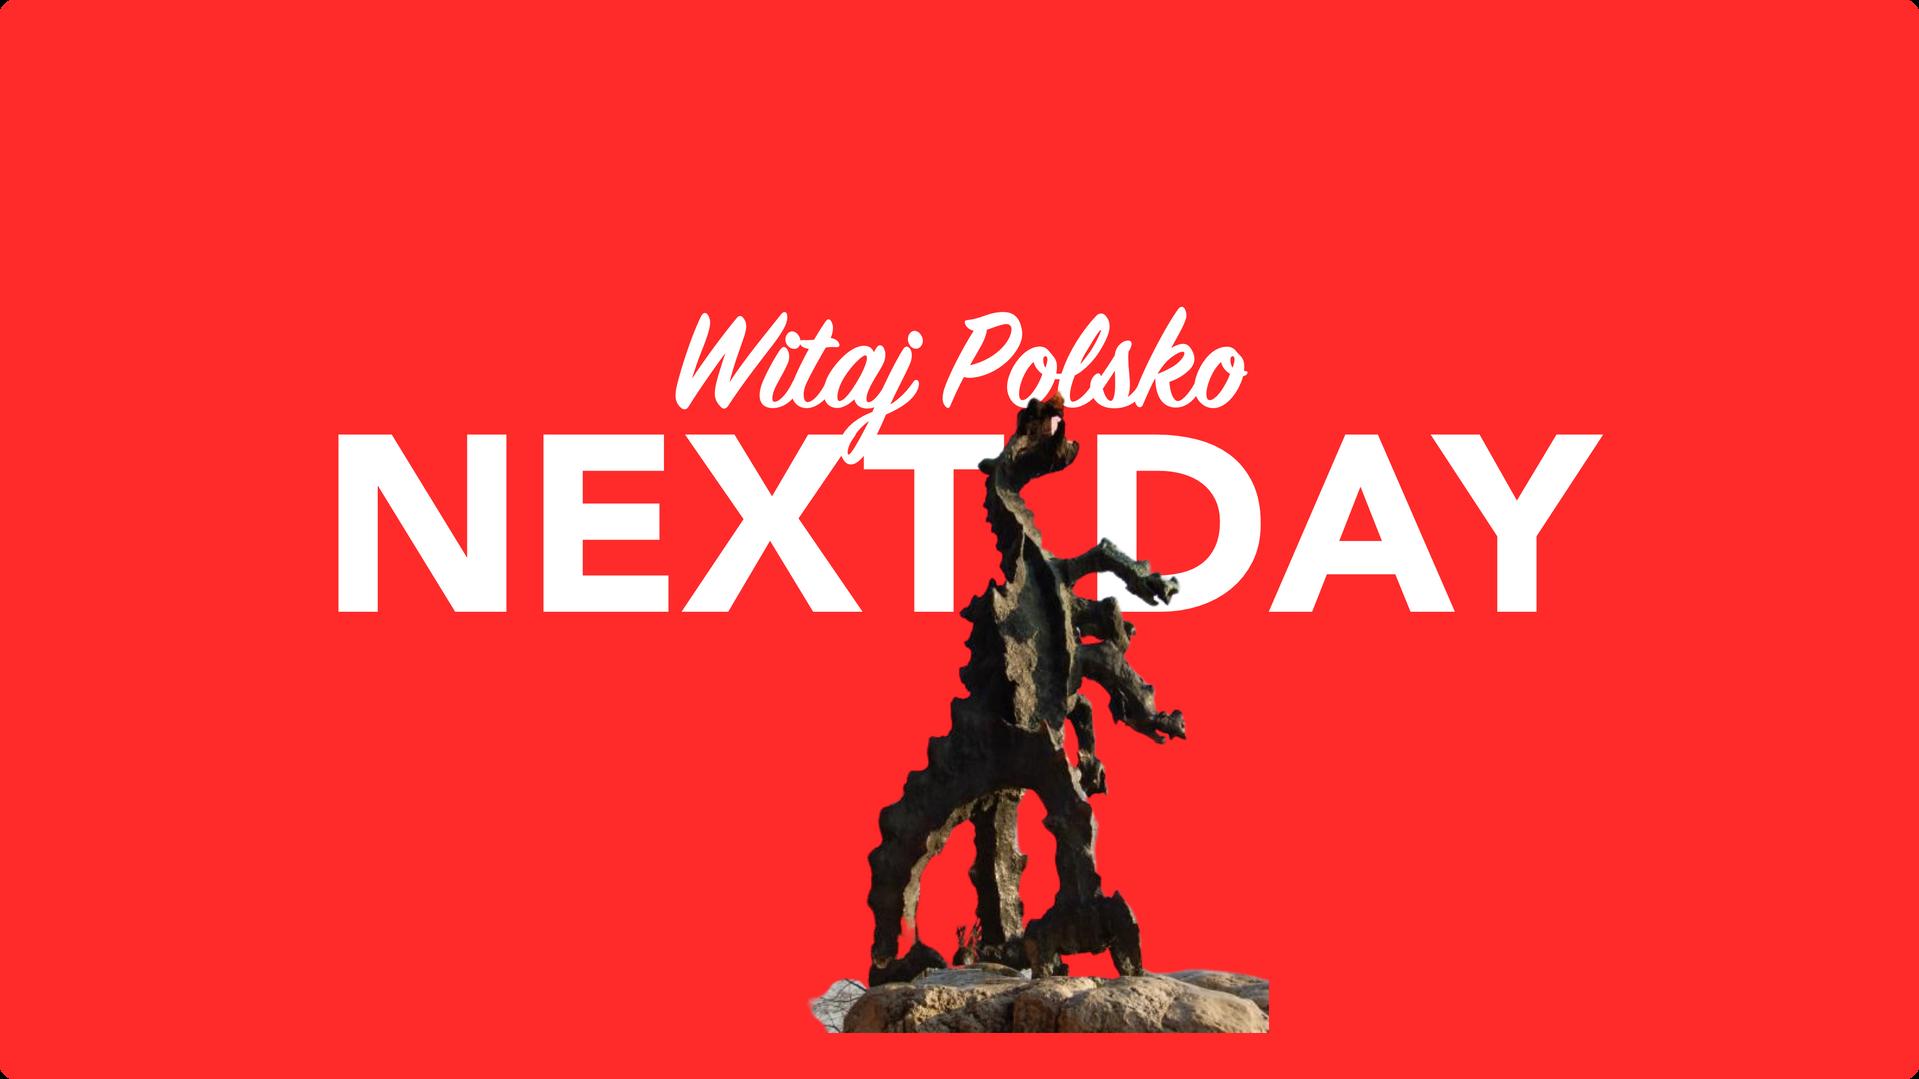 Polen Next Day 4xpress.com